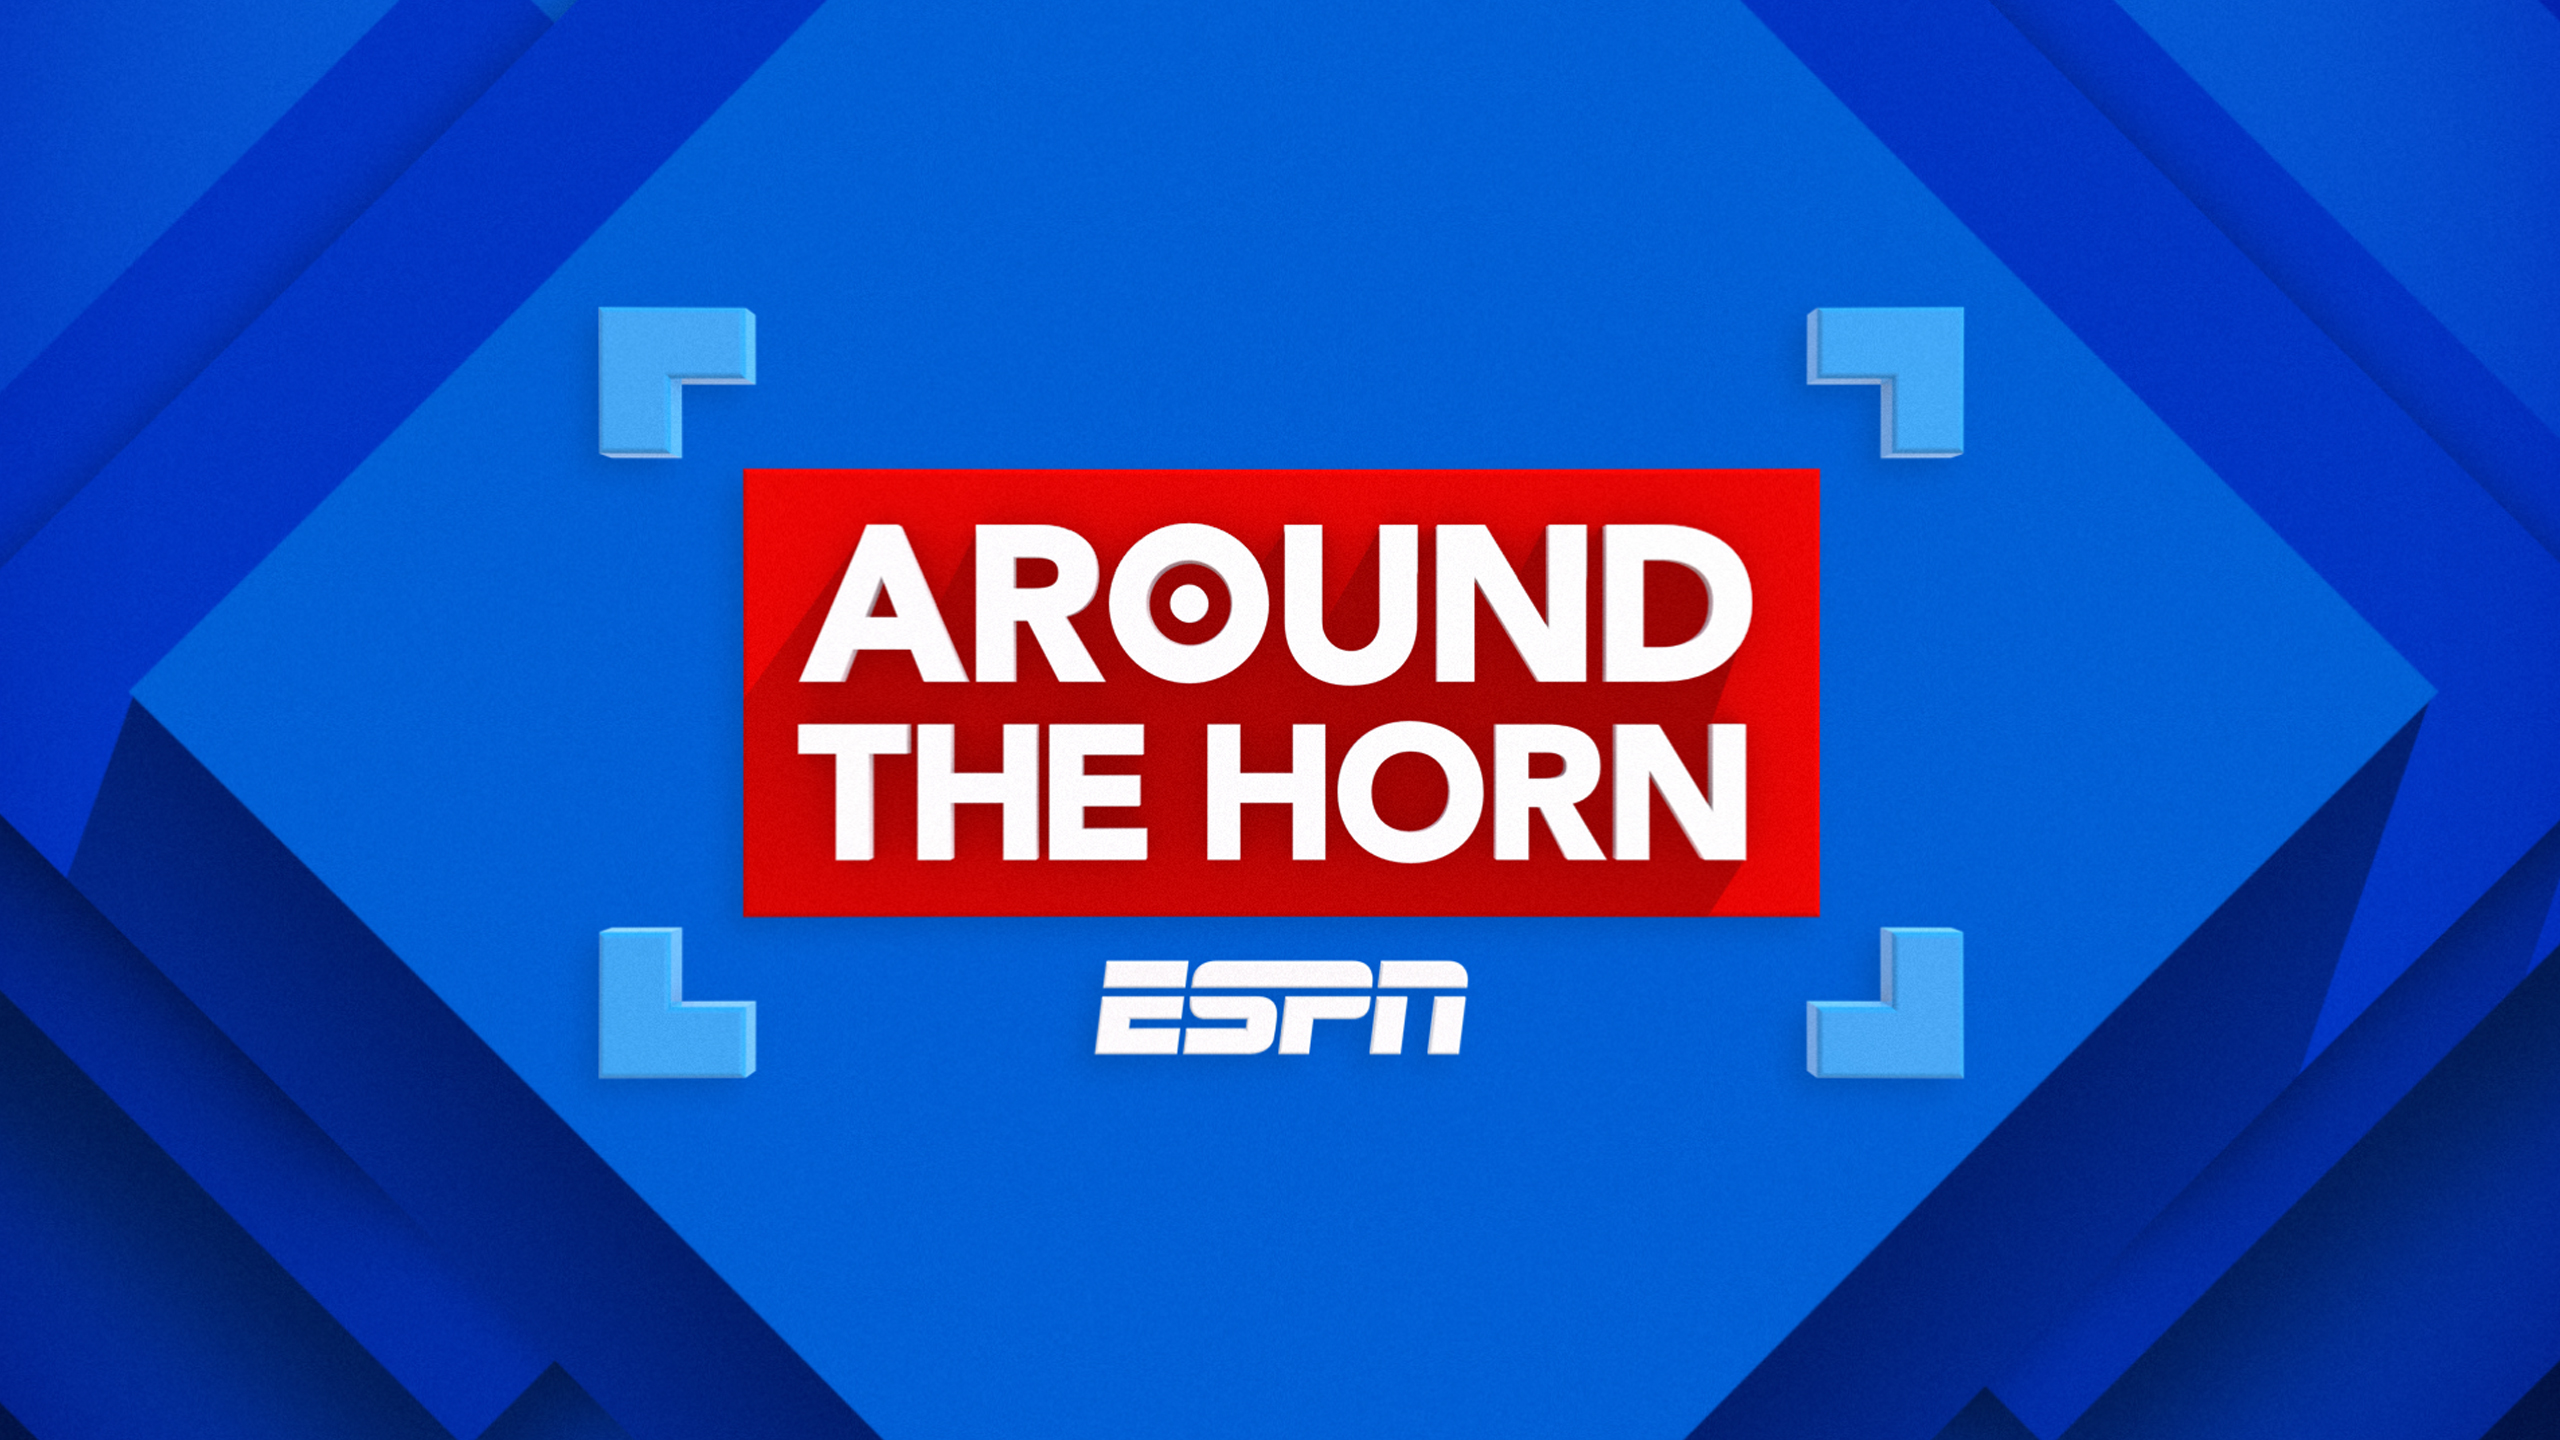 Thu, 12/6 - Around The Horn